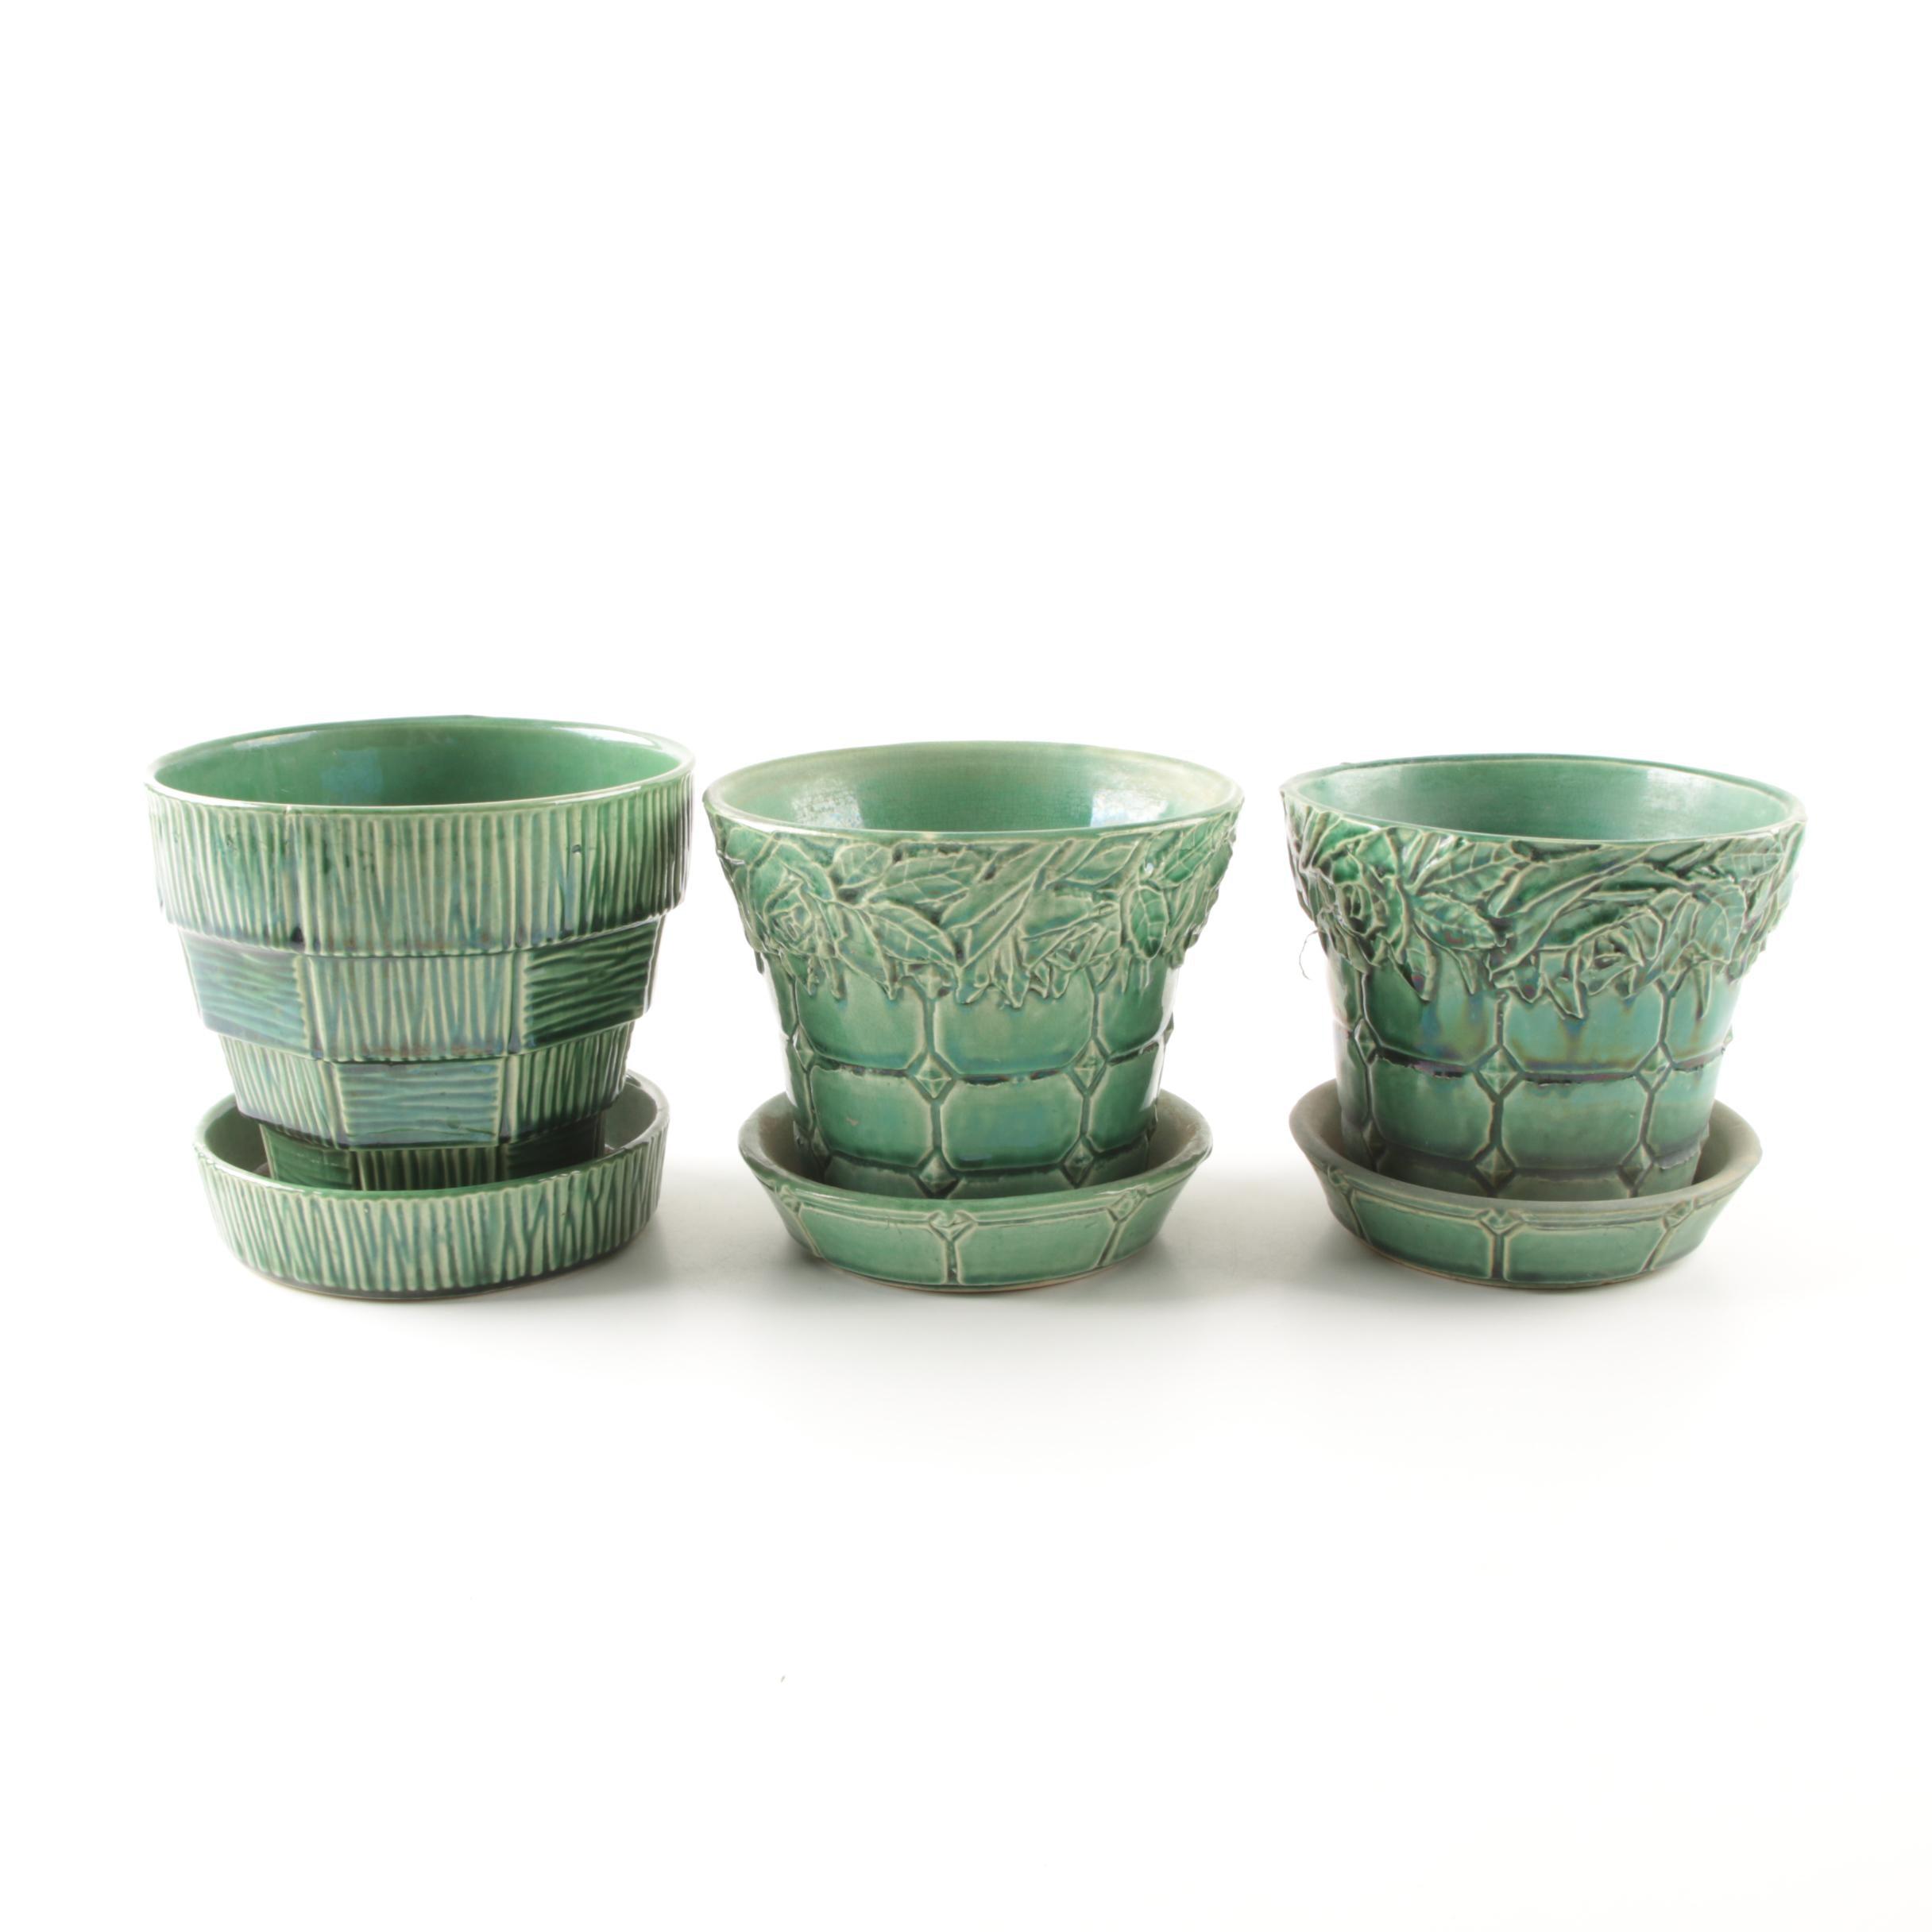 McCoy Art Pottery Planters